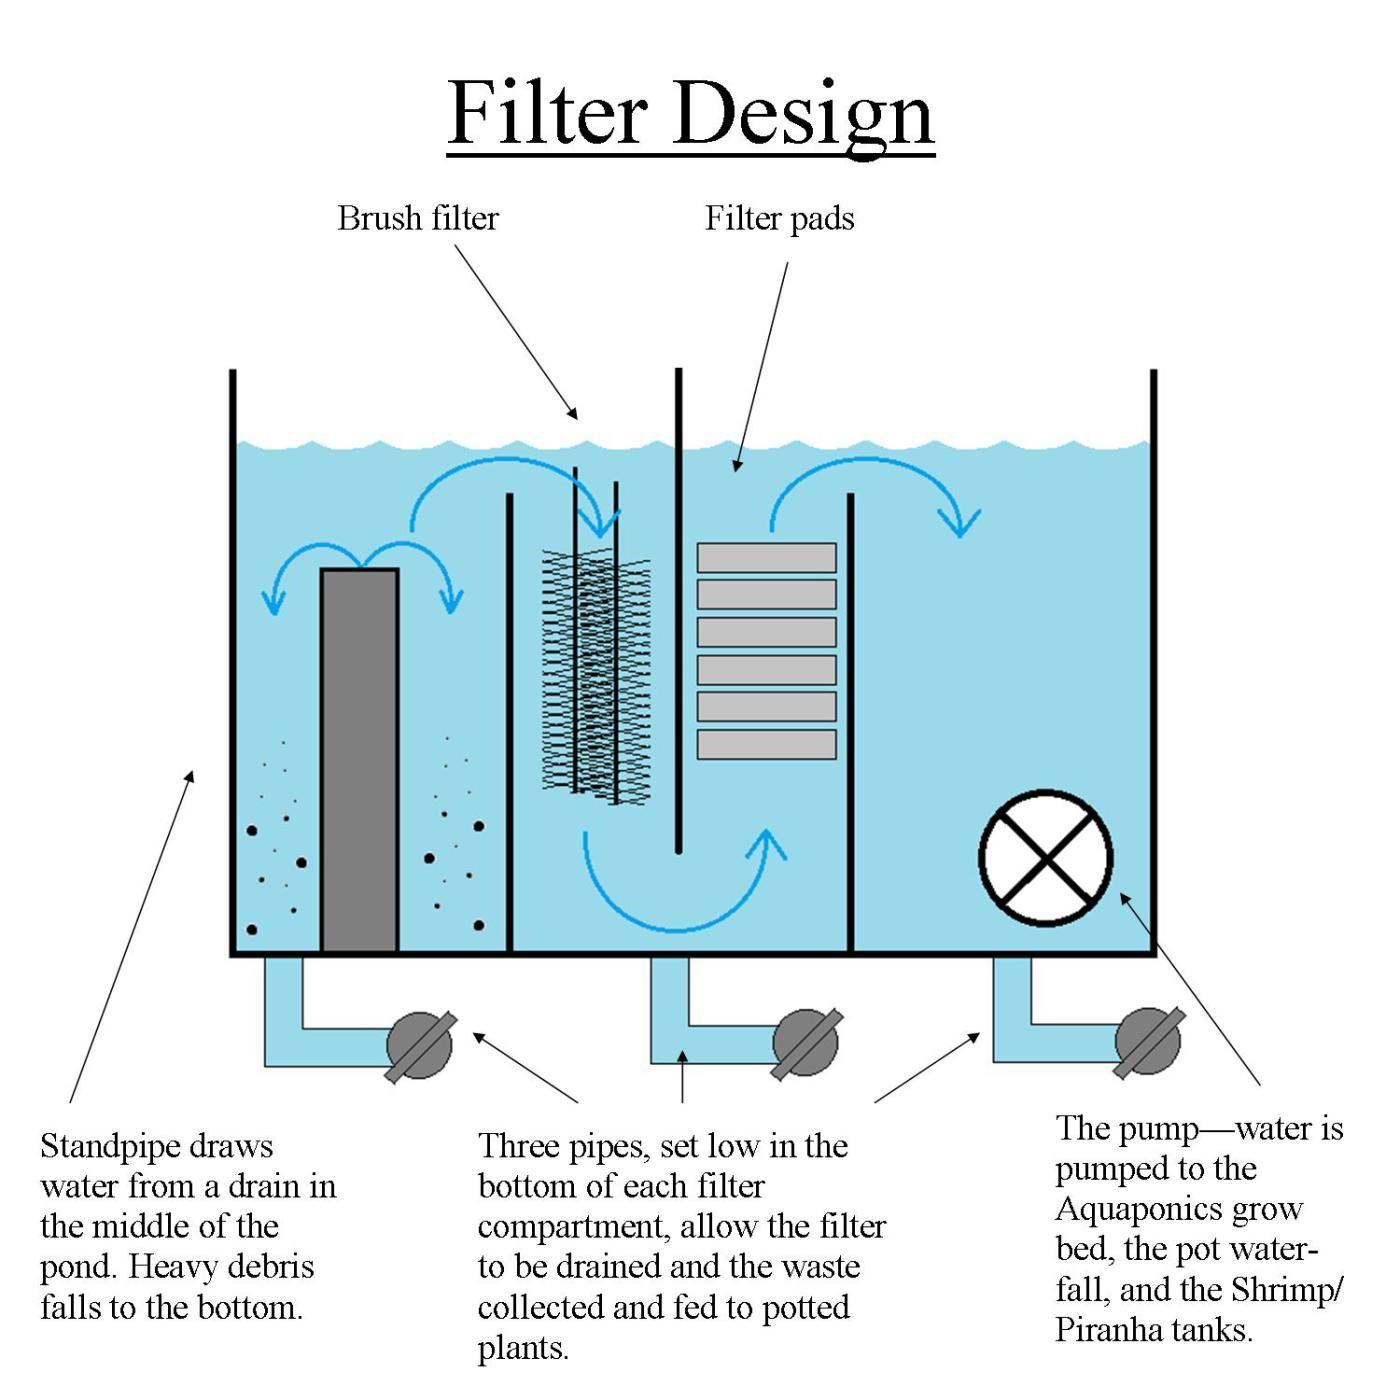 Aquaponics | Aquaponics & Fish | Pinterest | Pond, Filter and Box